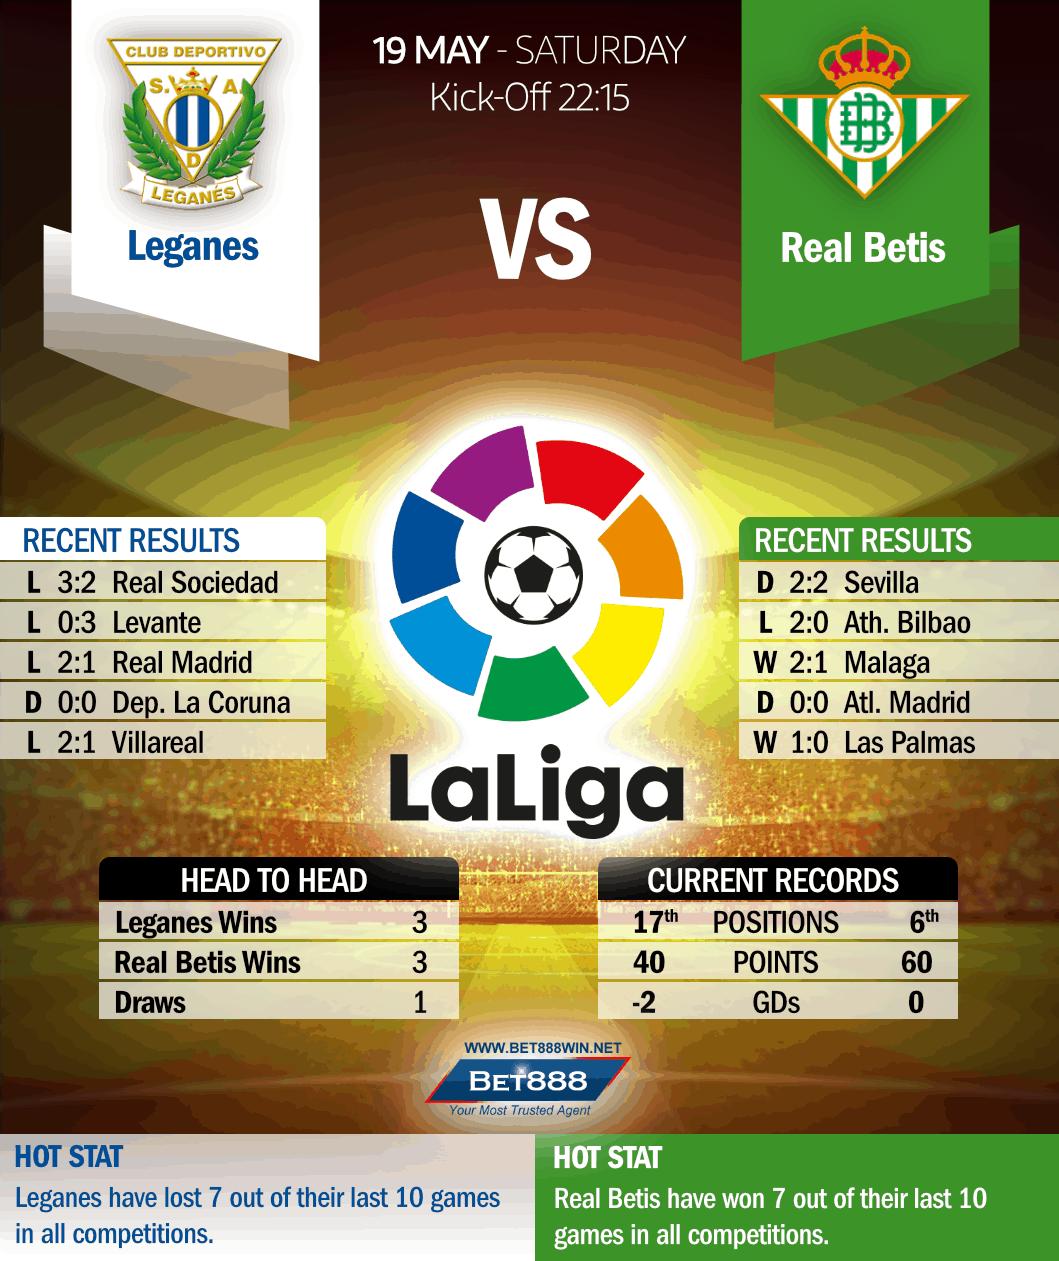 Leganes vs Real Betis 19/05/18